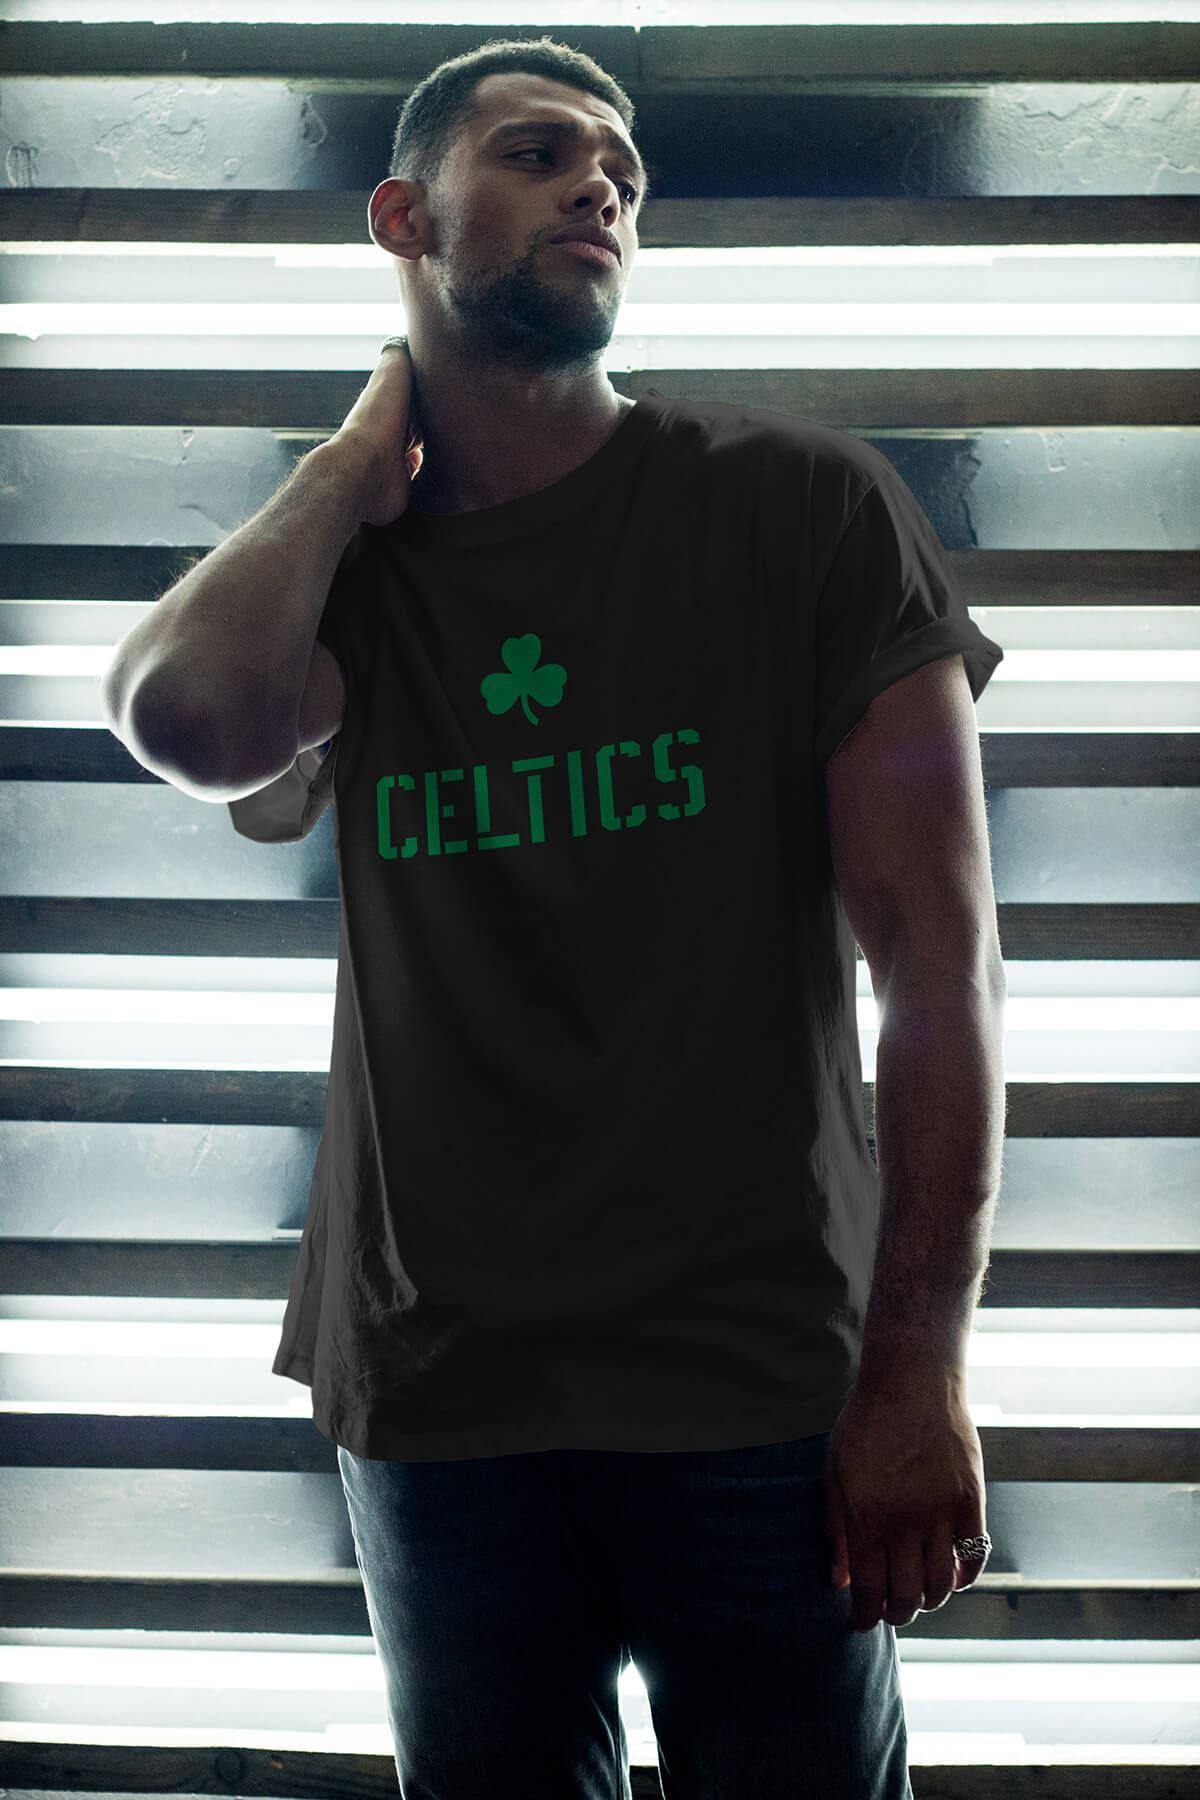 Boston Celtics 27 Siyah Erkek Oversize Tshirt - Tişört